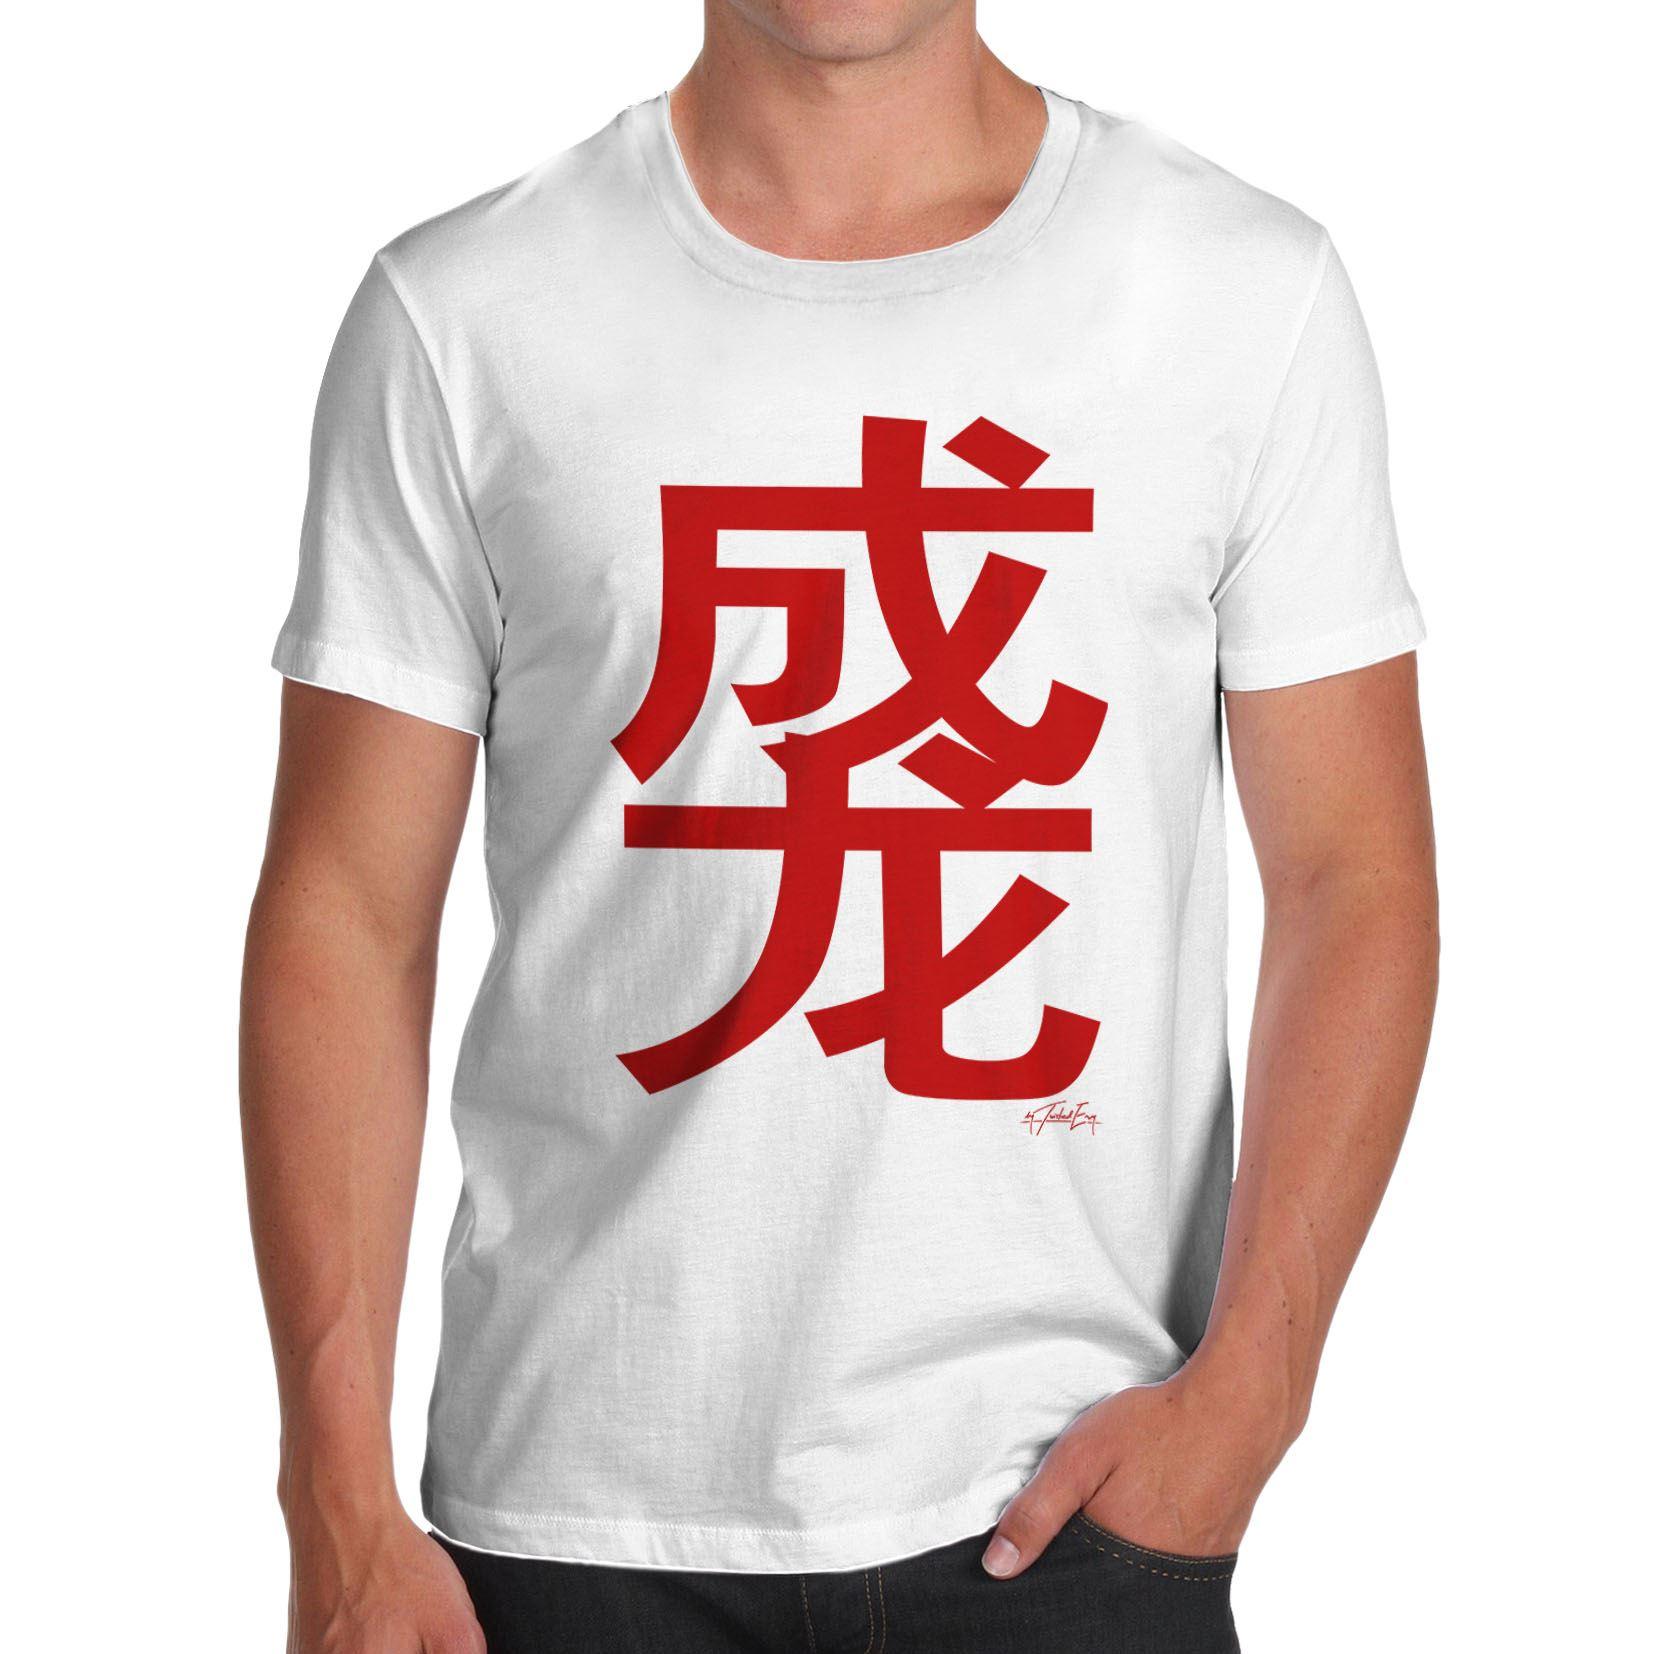 Mens Red Duang Chinese Character T Shirt Ebay